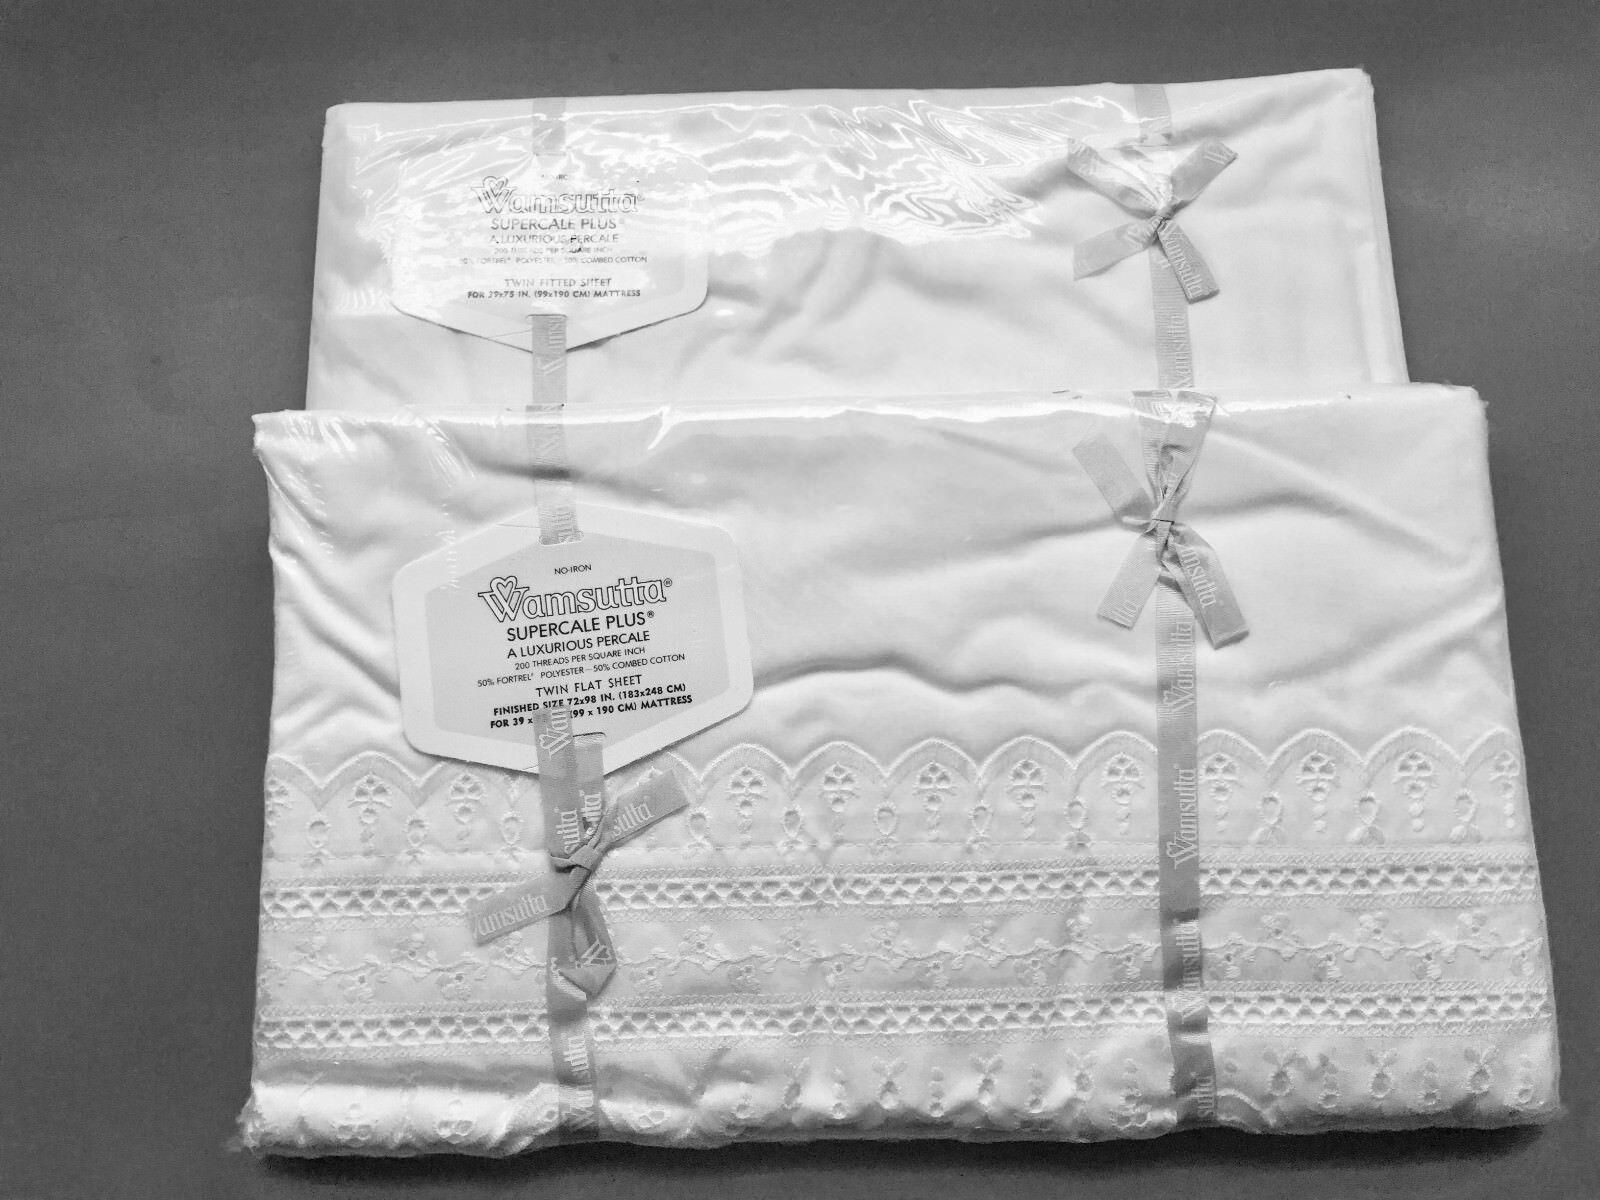 Funda Nordica Desigual Japanese.Hill Wamsutta Supercale Flat Twin Fitted White Eyelet Sheet Set